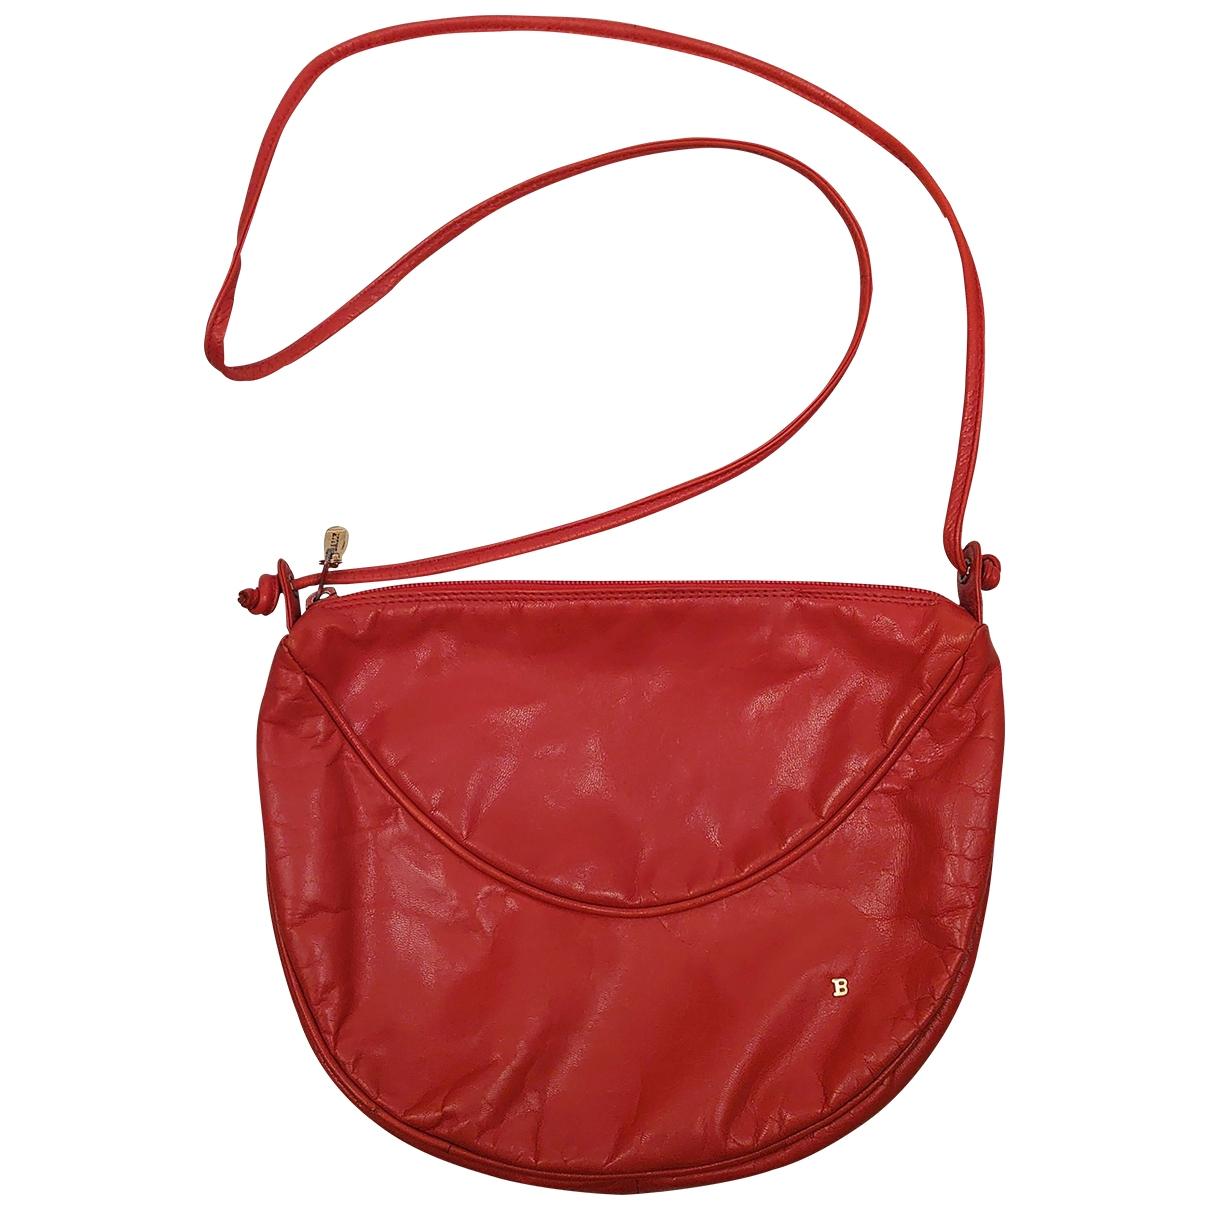 Bally \N Handtasche in  Rot Leder